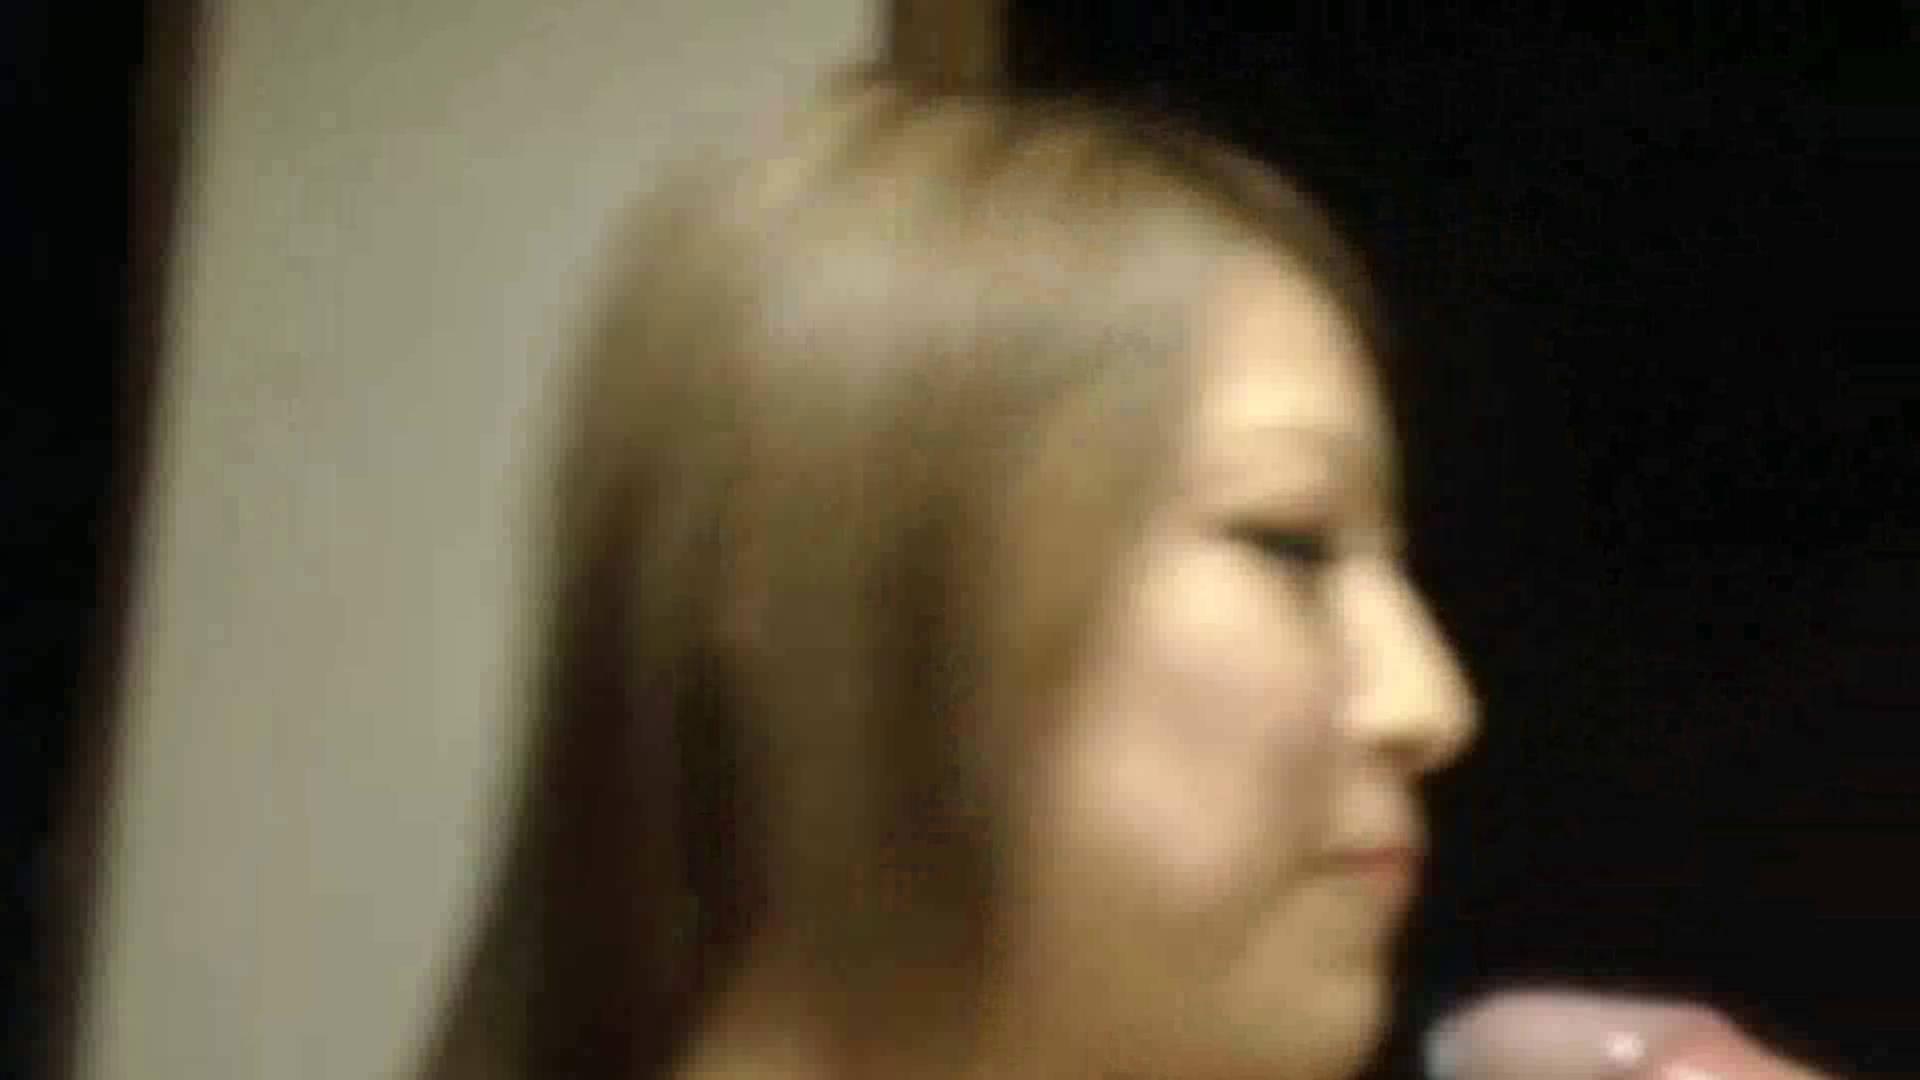 S級ギャルのハメ撮り!生チャット!Vol.20後編 美女ヌード オマンコ無修正動画無料 97画像 79